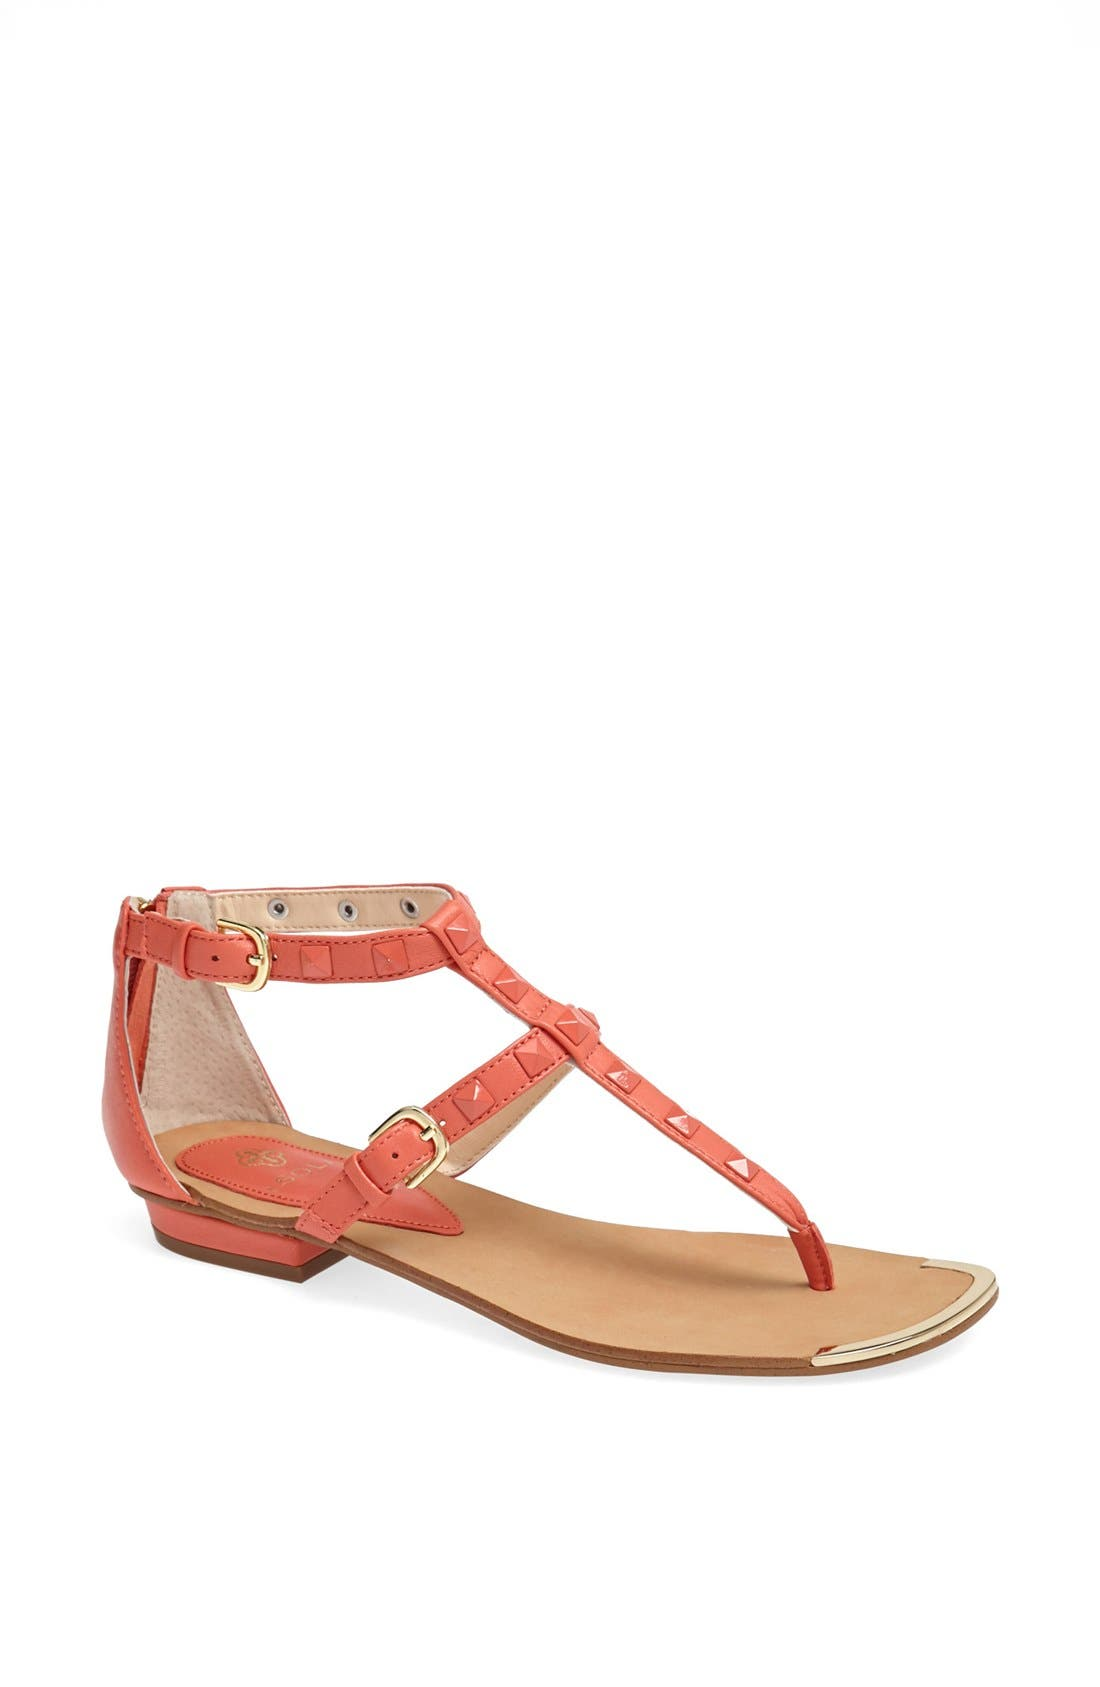 Main Image - Isolá 'Adie' Studded Leather Thong Sandal